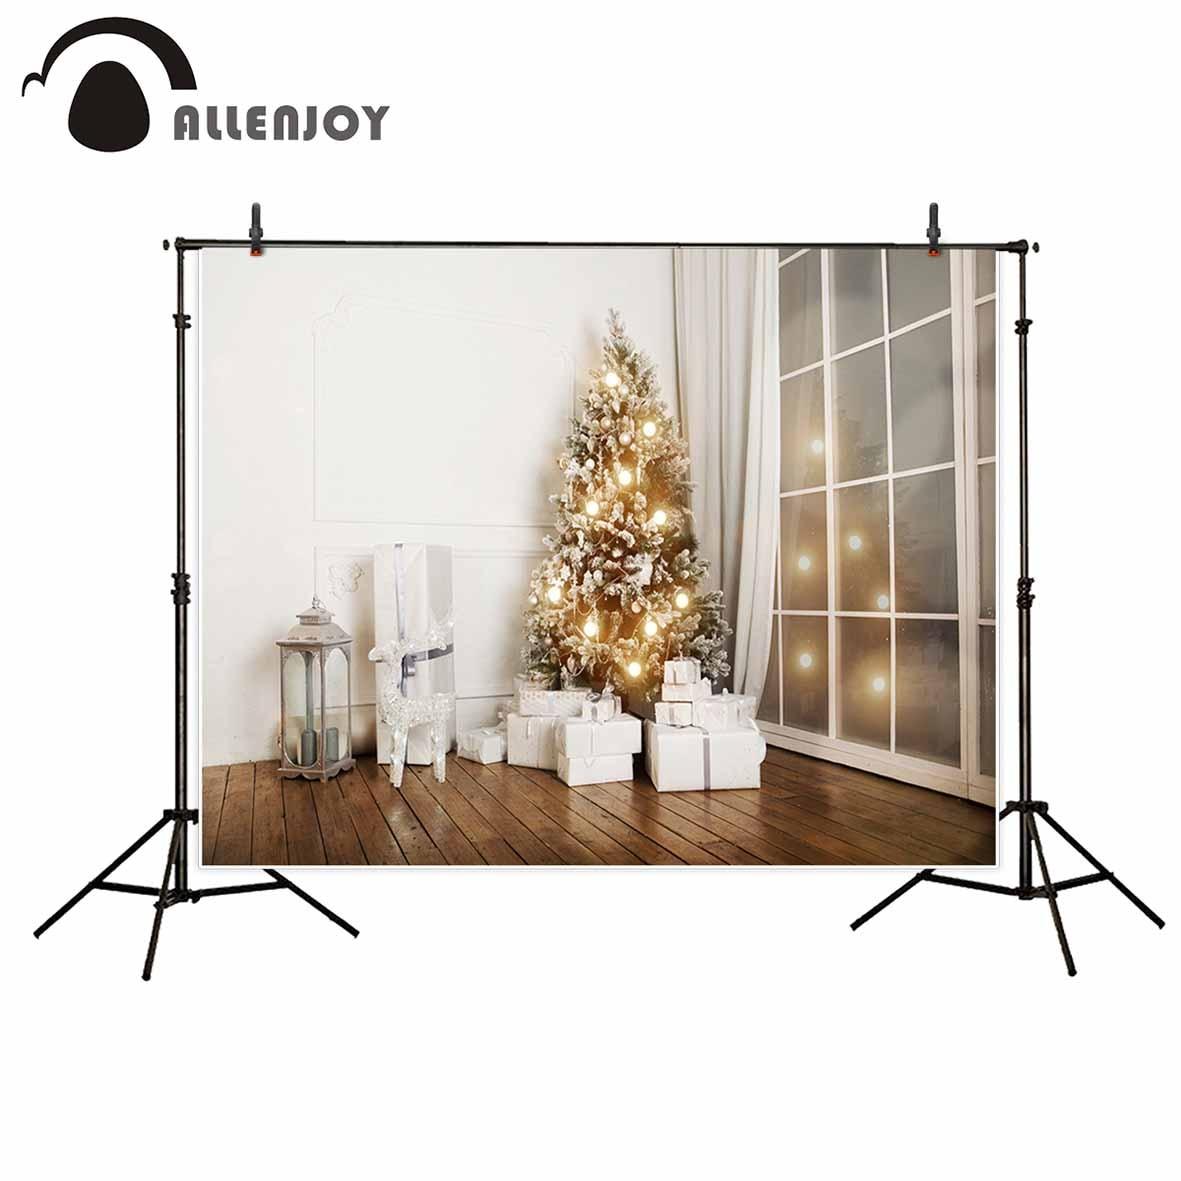 Allenjoy photography Christmas background small bulbs gift wooden floor door backdrop background photography